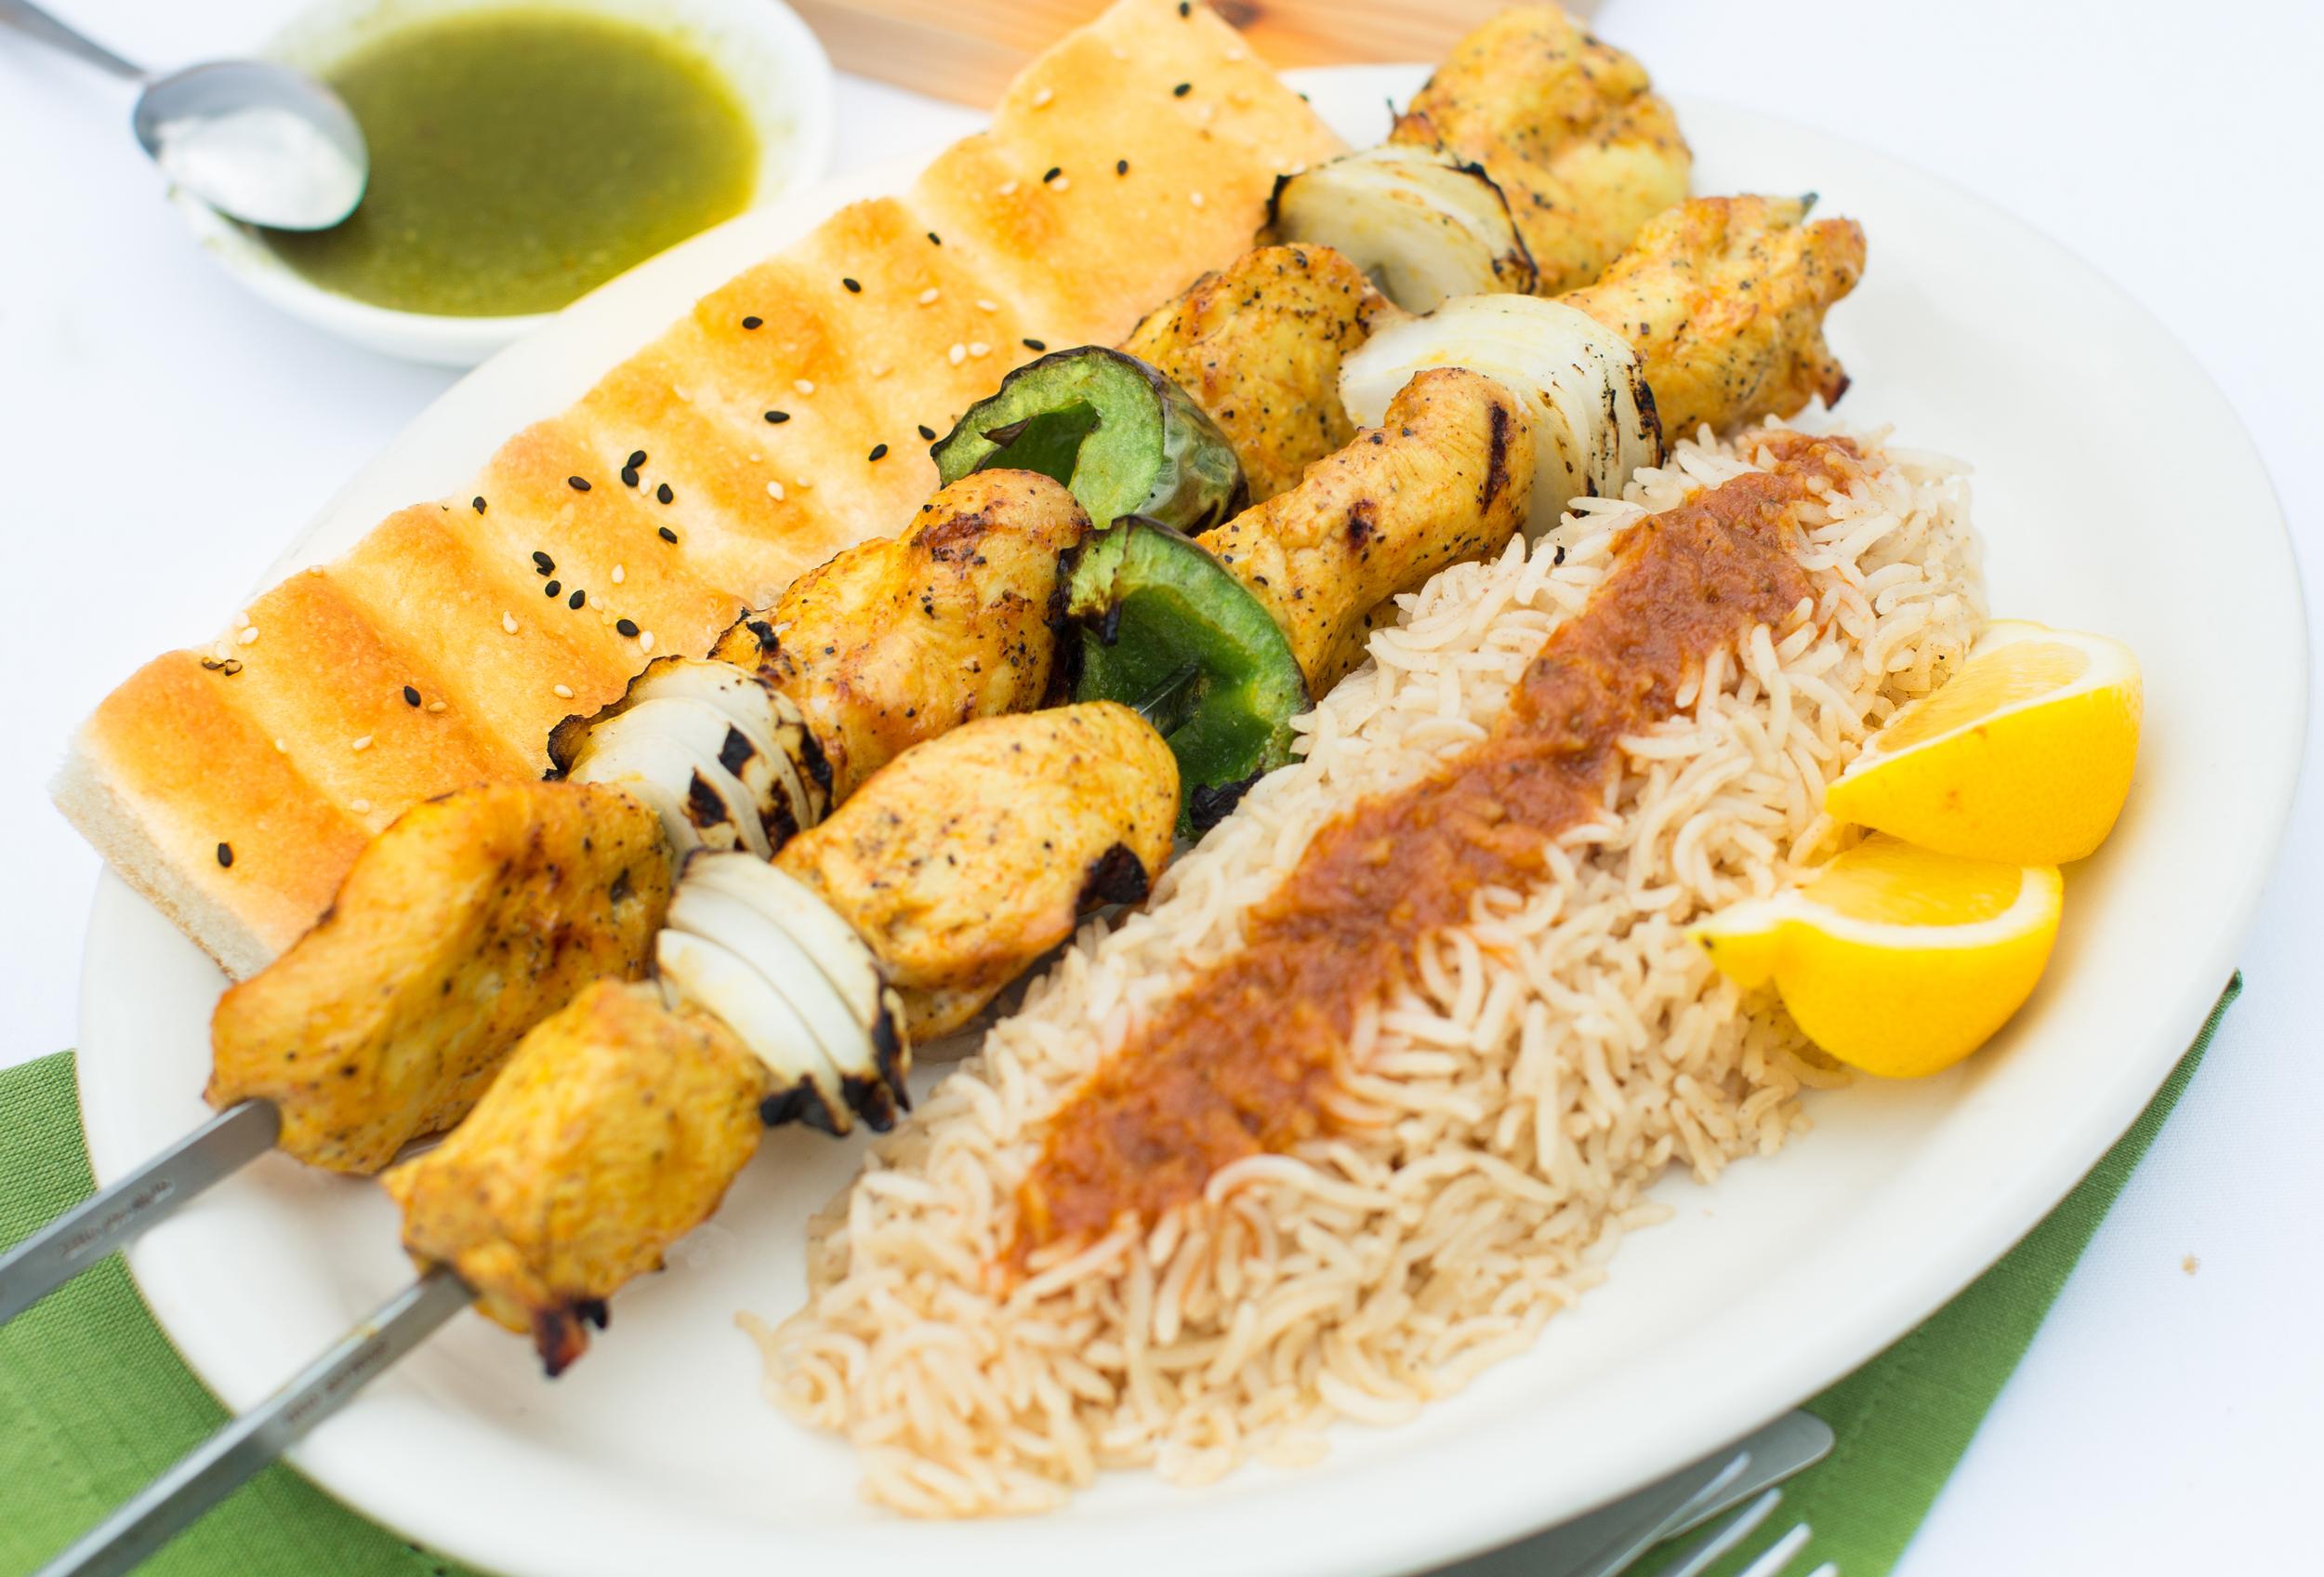 Panjshir-Cam-2-horizontal-11-nabu-food-photography.jpg